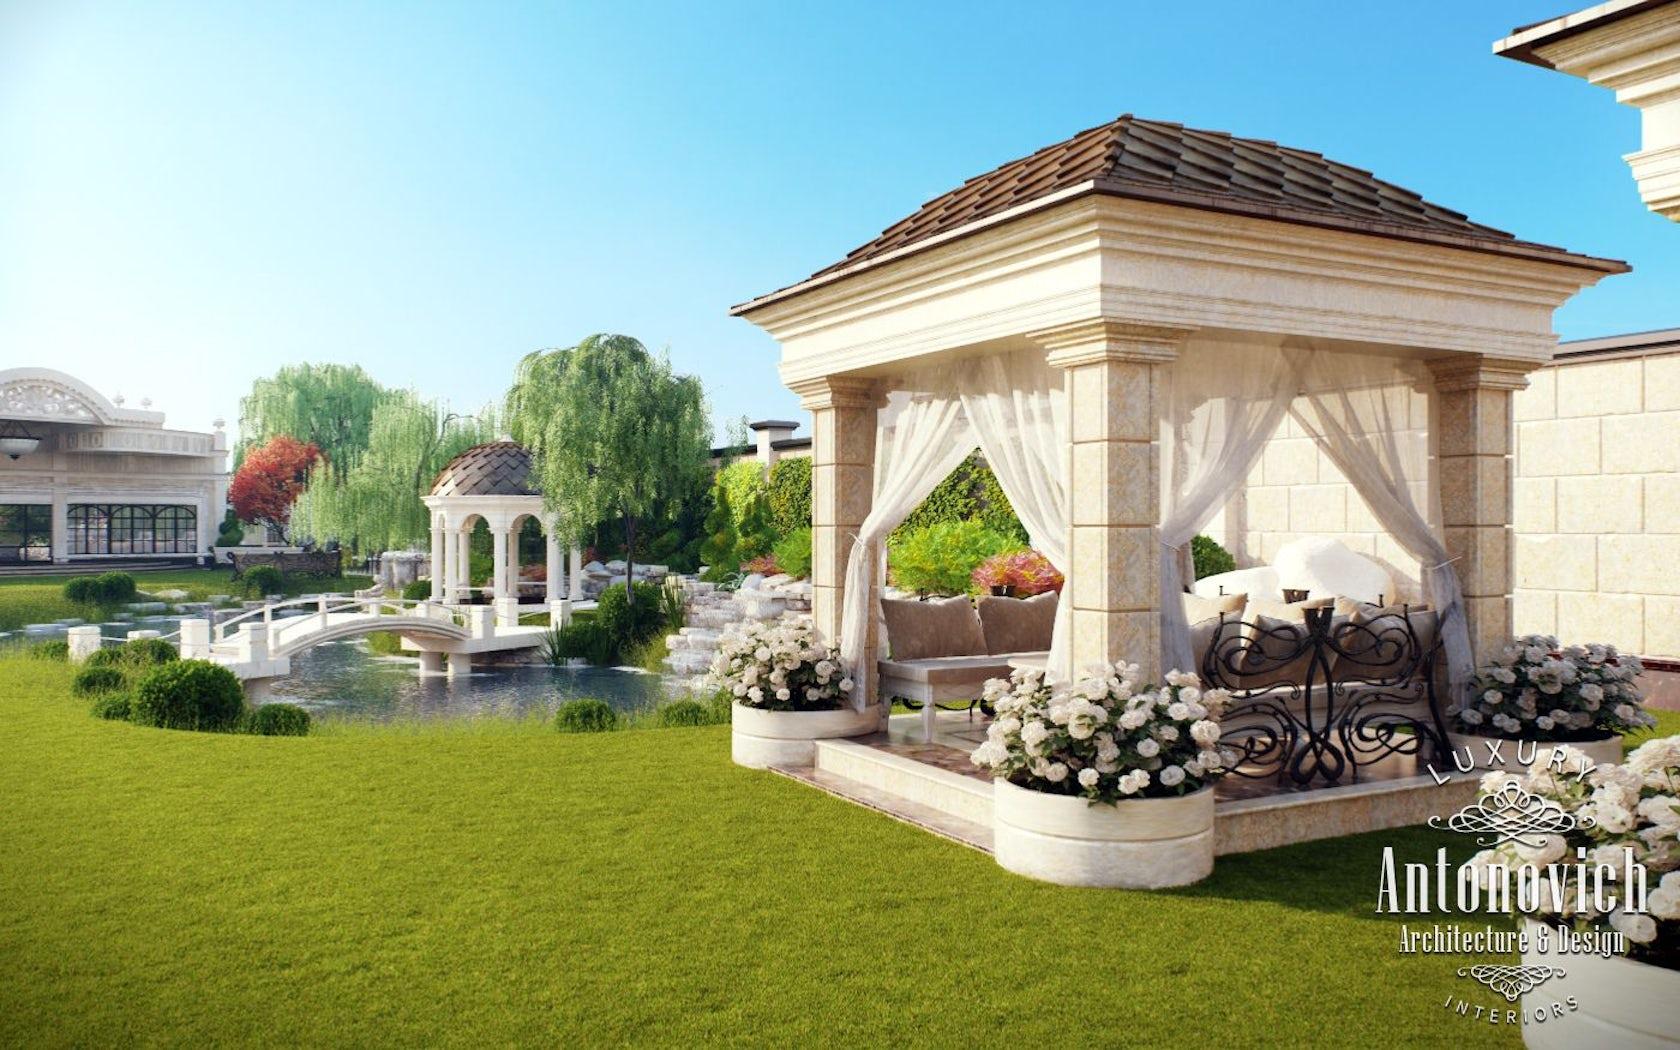 Garden landscaping Dubai from Luxury Antonovich Design ...